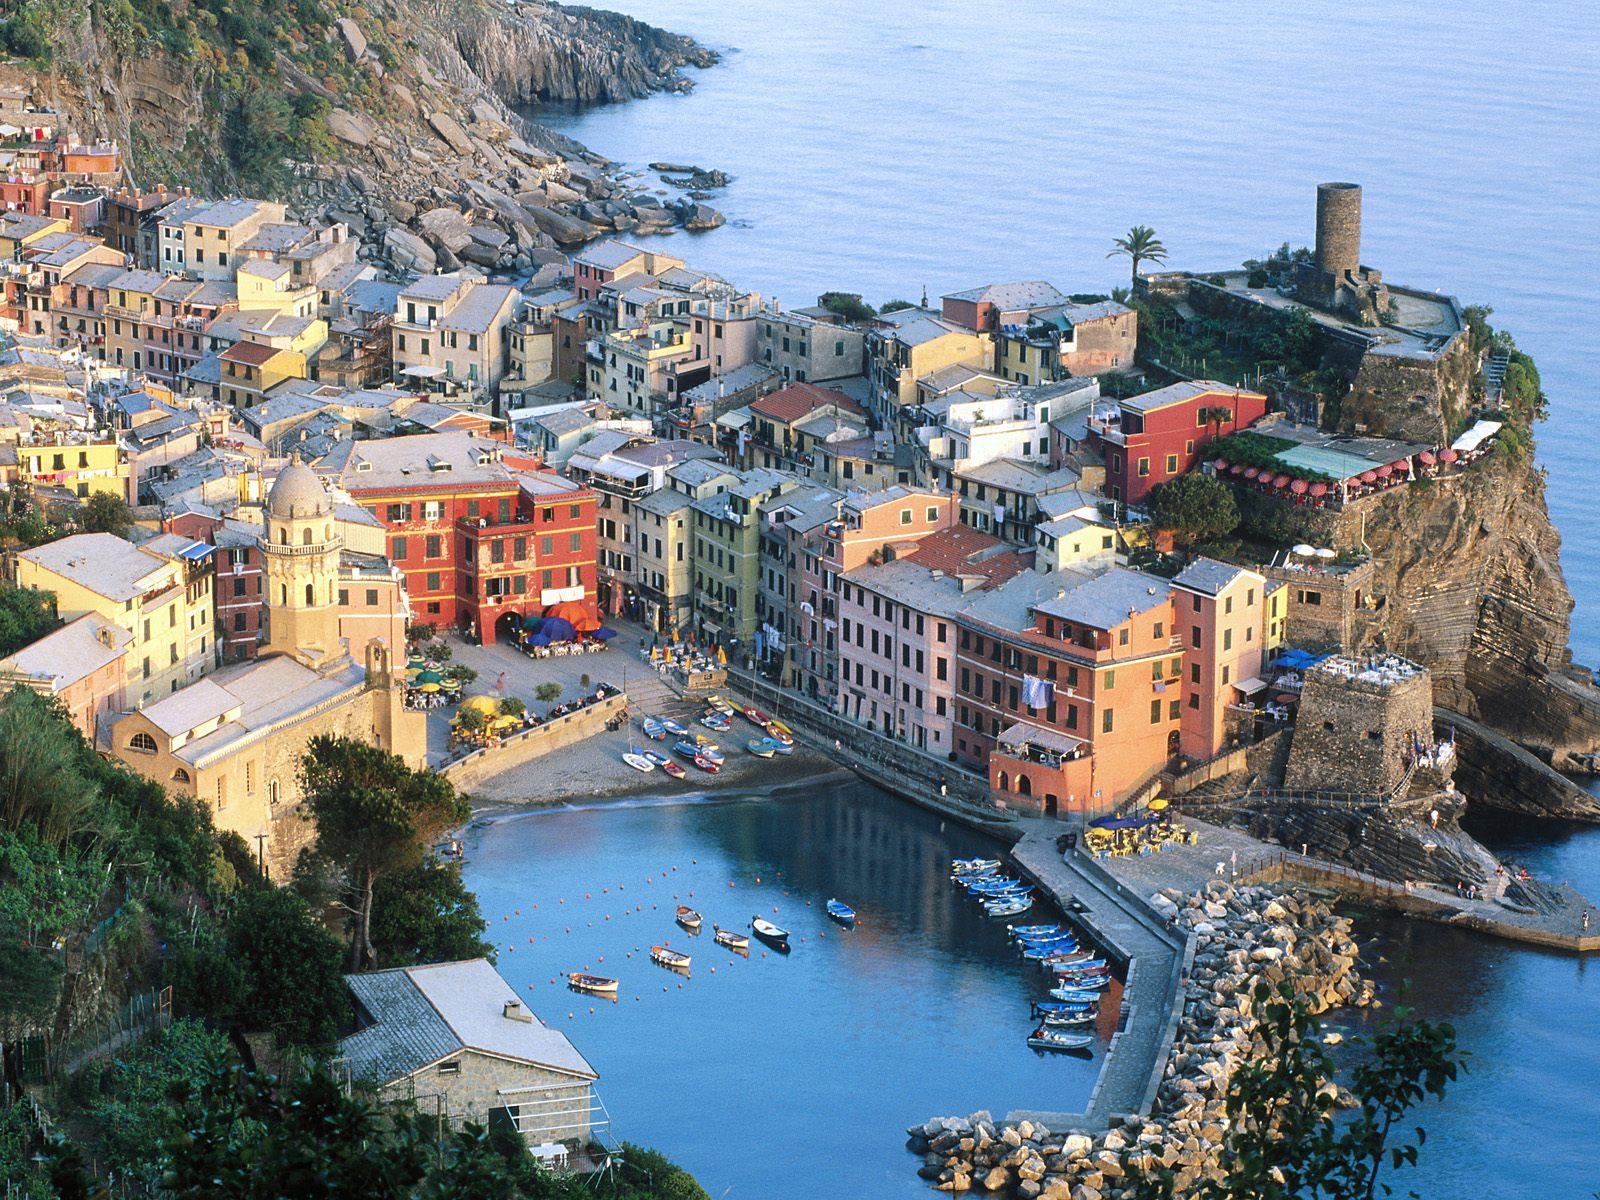 http://1.bp.blogspot.com/_e6DyH-BVX80/TK3XGtJzRyI/AAAAAAAADfk/wMgS-KZFUGc/s1600/Vernazza_Cinque_Terre_Liguria_Italy.jpg